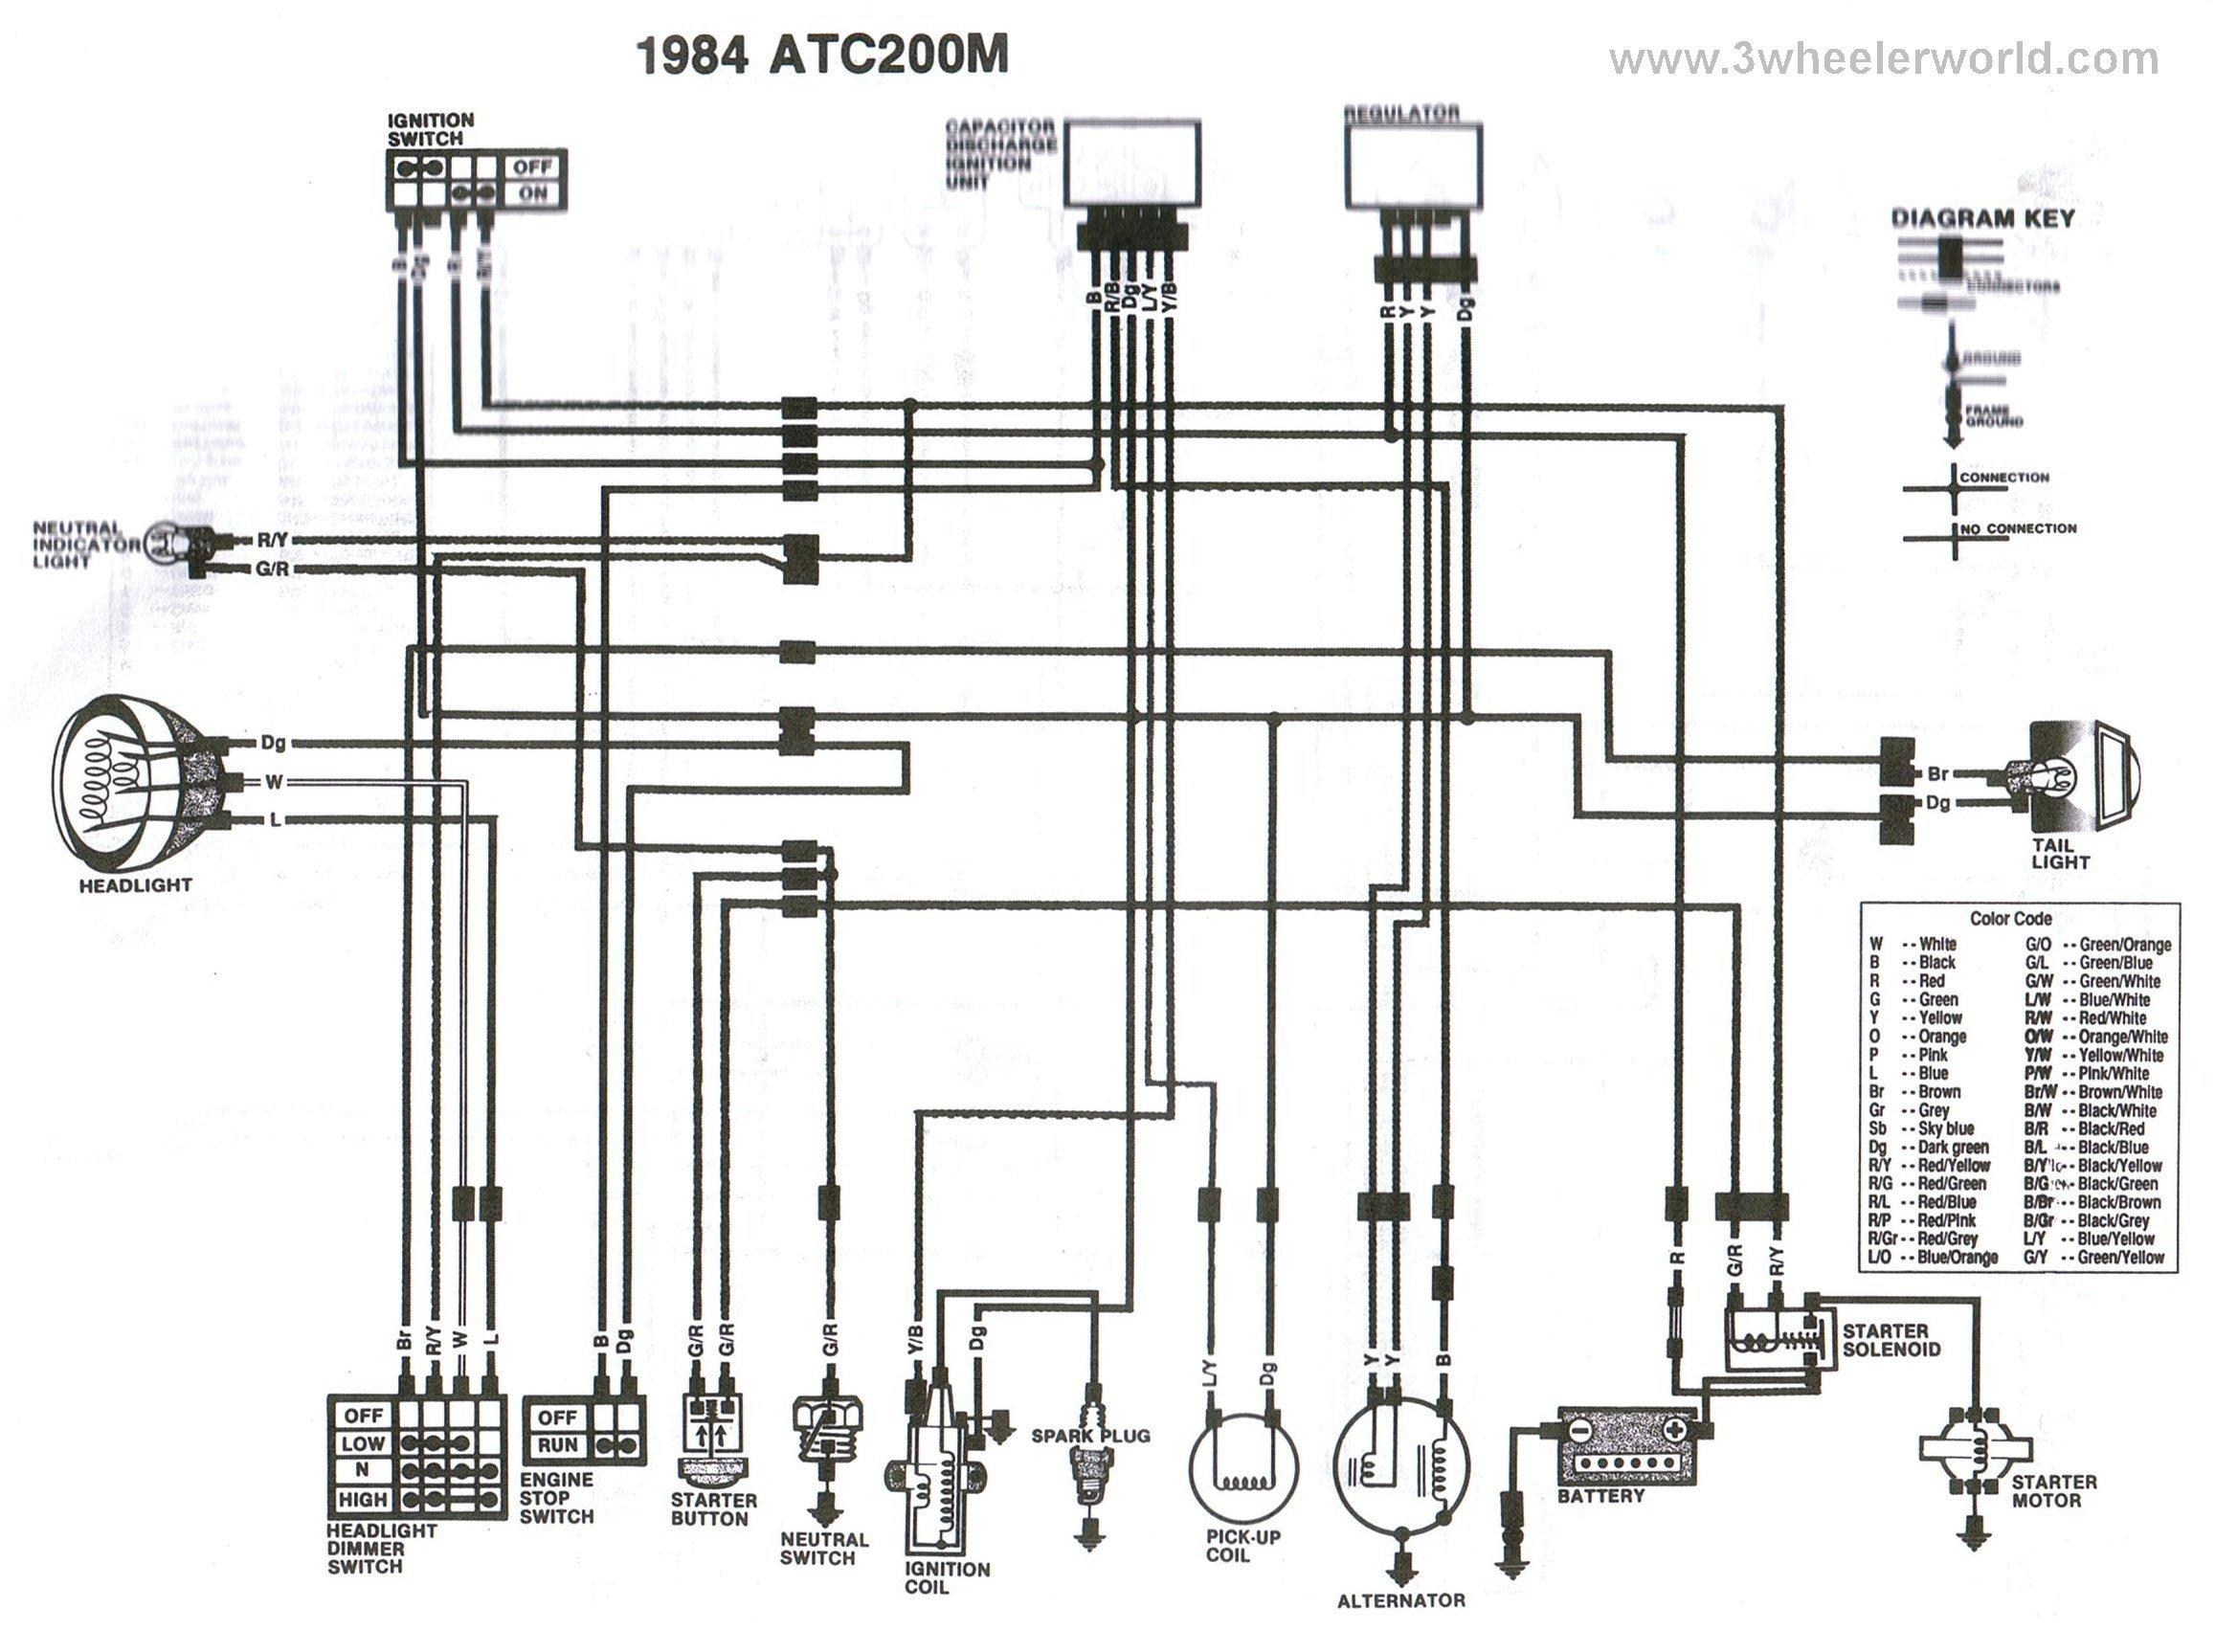 MH_8184] 3Wheeler World Honda Atc Wiring Diagrams Free DiagramOtaxy Hroni Dimet Olyti Opogo Xaem Stap Onom Garna Mohammedshrine Librar  Wiring 101